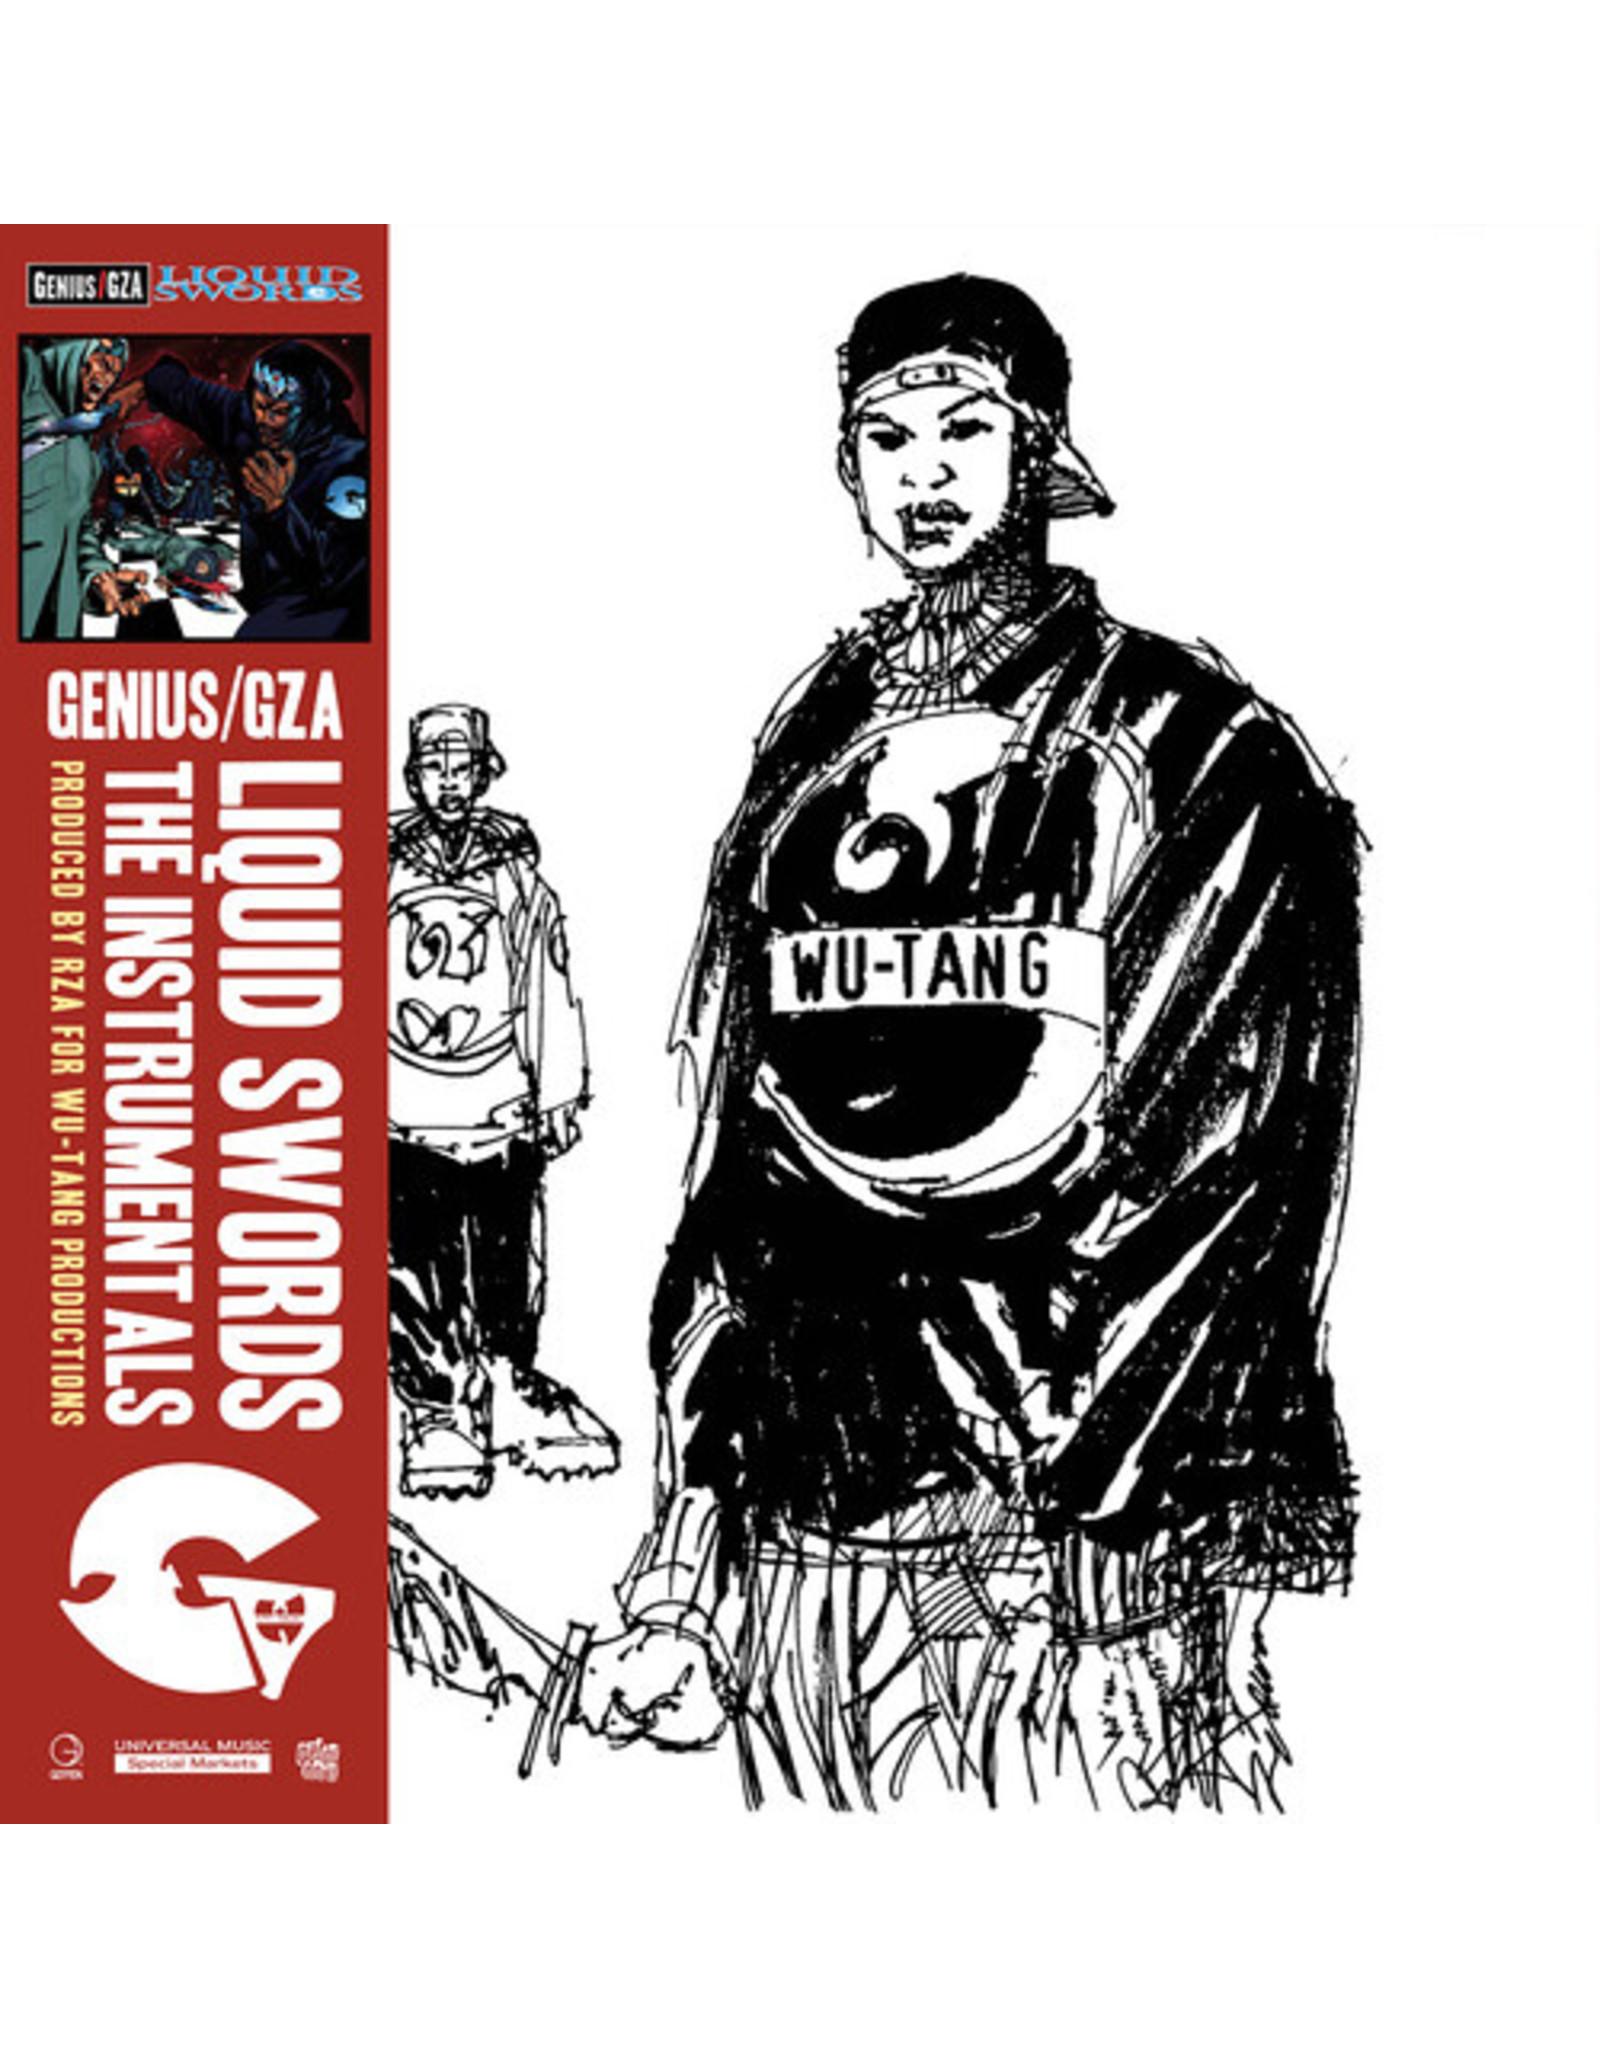 New Vinyl Genius/GZA - Liquid Swords Instrumentals 2LP